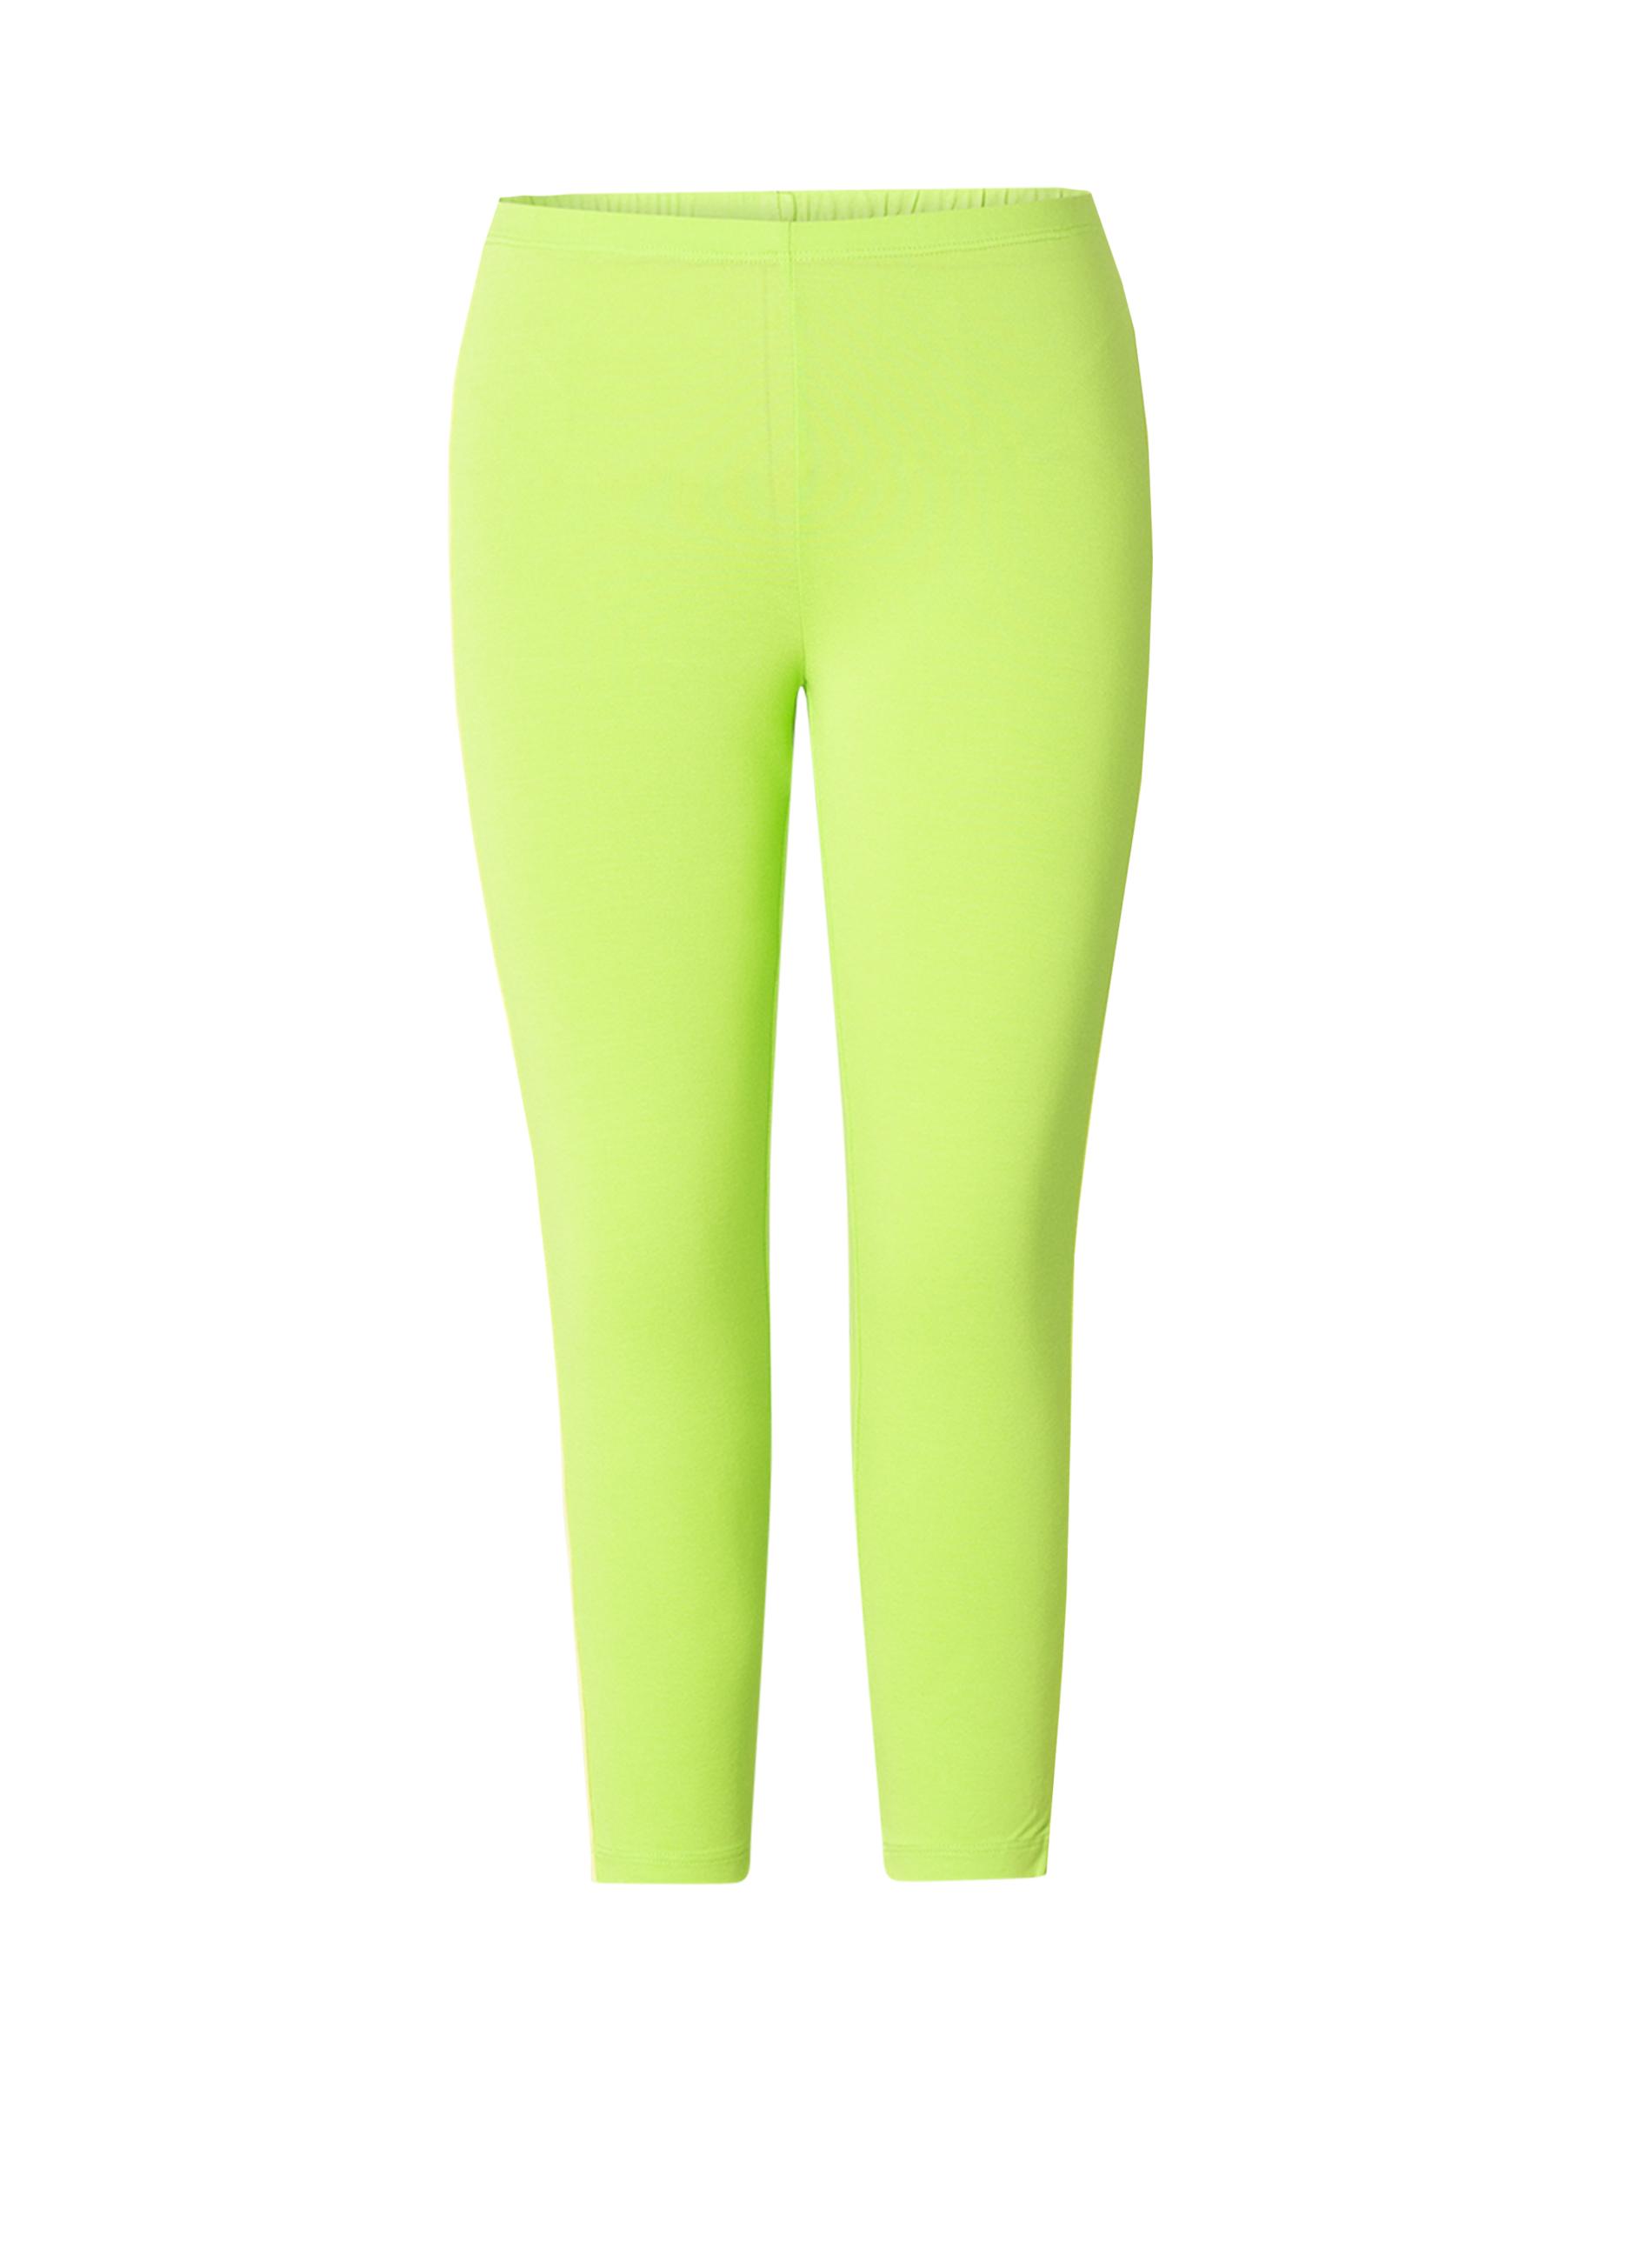 Yesta legging Audrey Essential 23 in